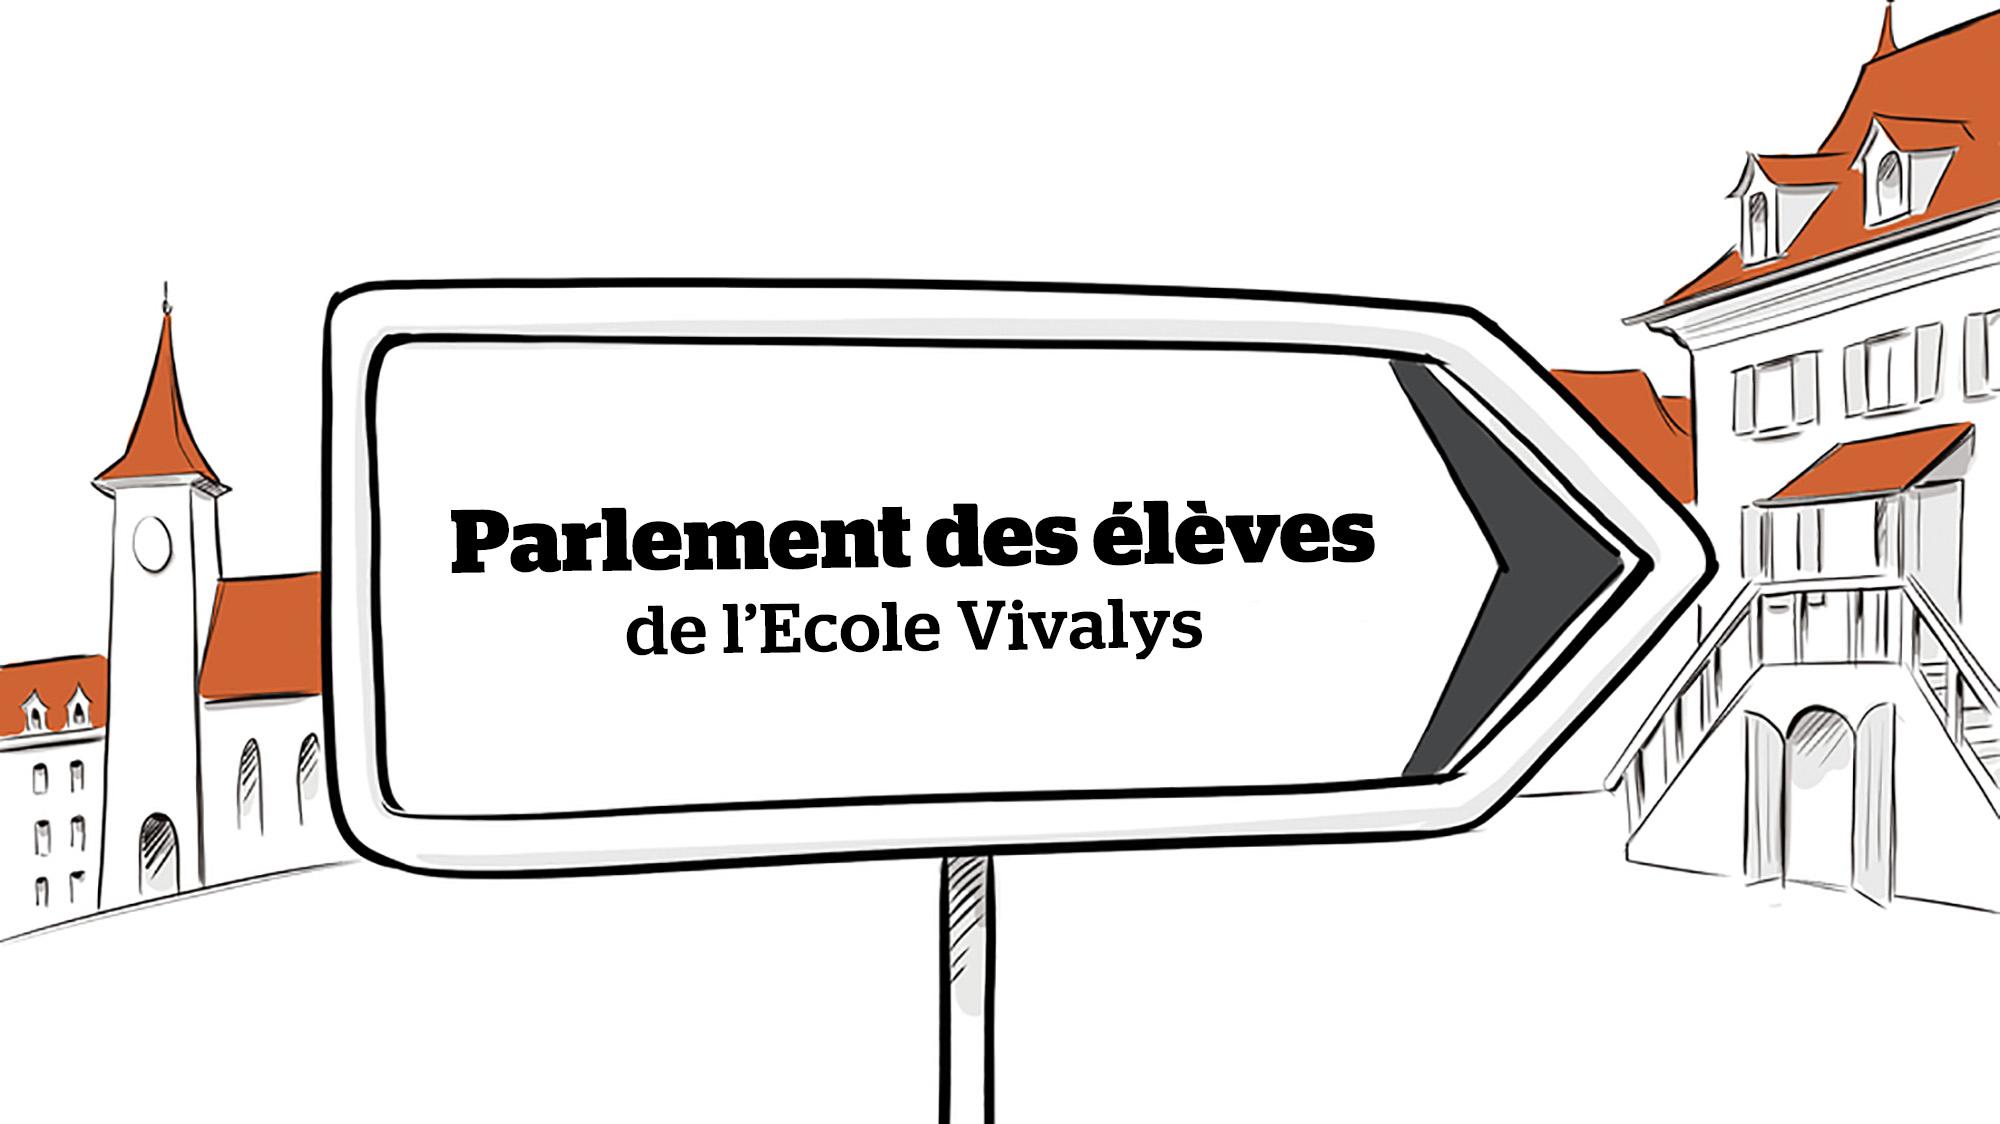 ecole-vivalys-parlement-eleves-0